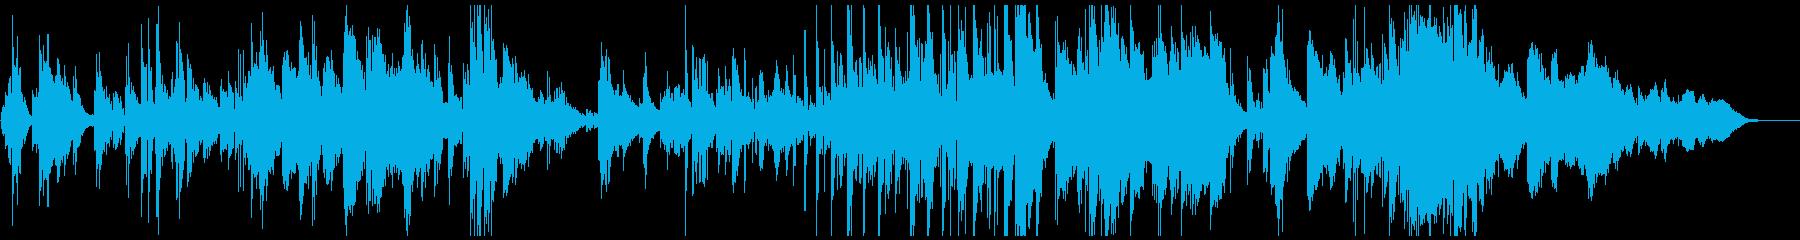 HAZE OF THE SUNFLOWERの再生済みの波形